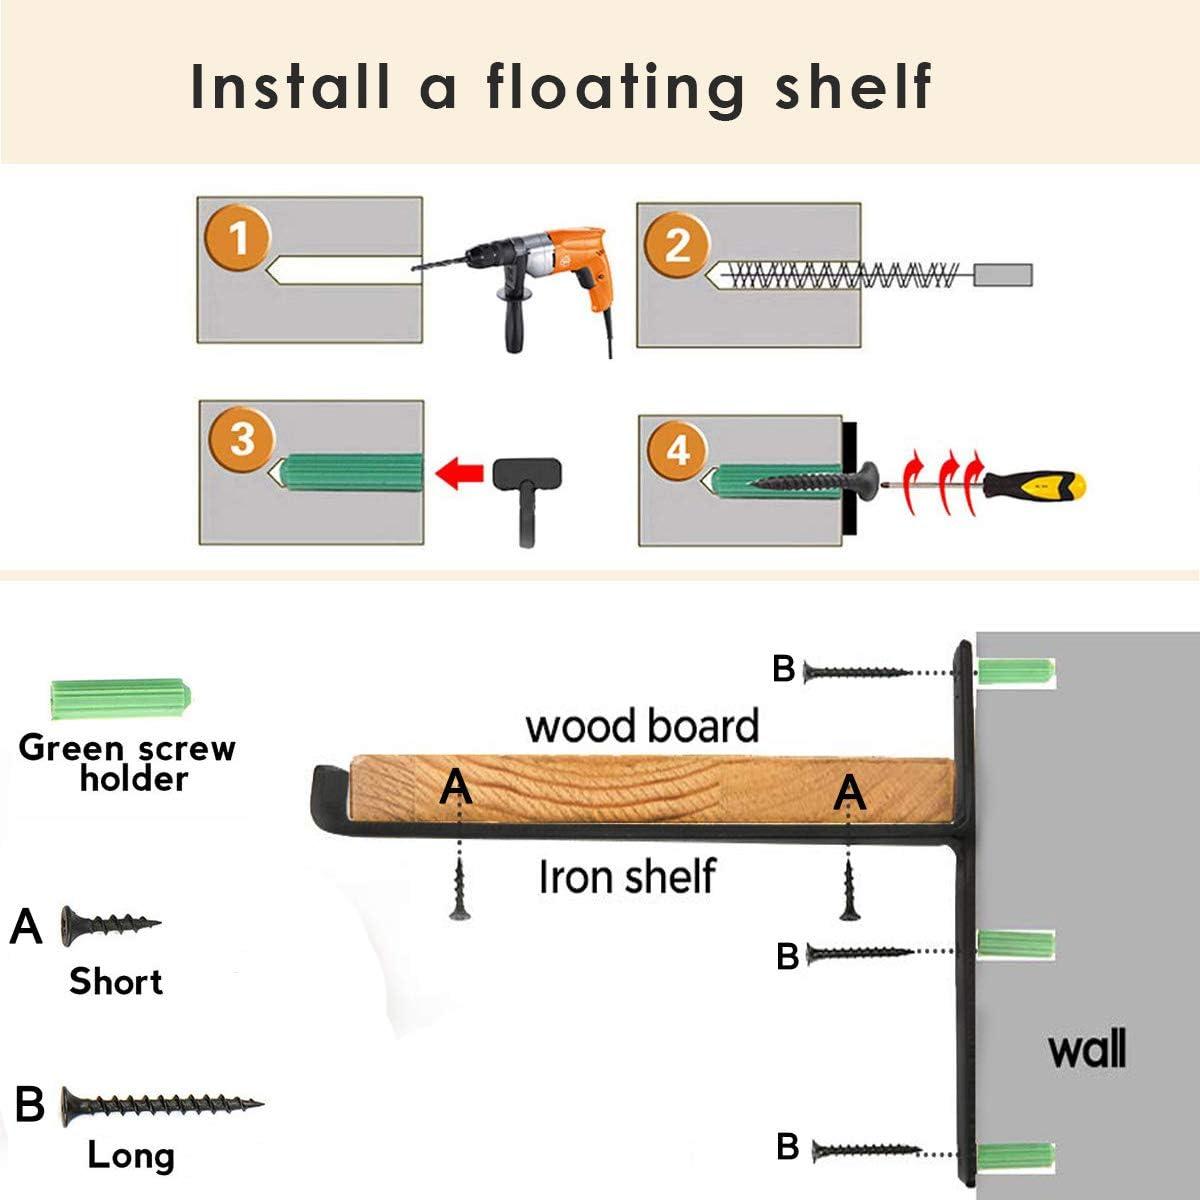 Display Wall Shelf Bracket 10.5 Inches 4Pcs Floating Shelf Brackets Wall Storage Shelf Supports Angle Braces Brackets for Bookshelf